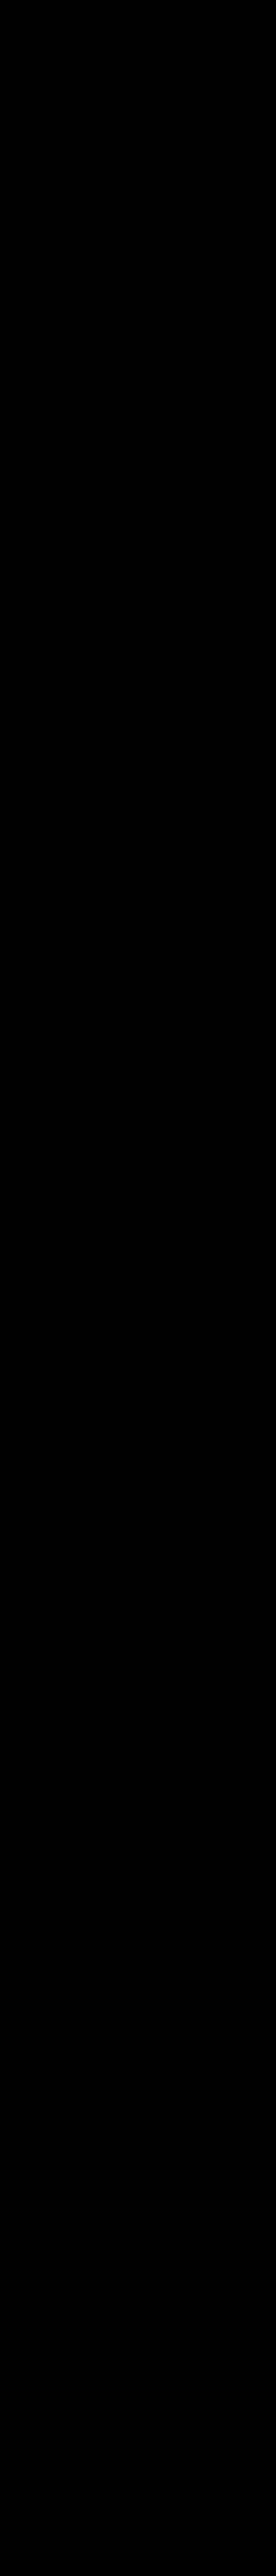 Chameli Sans Regular font